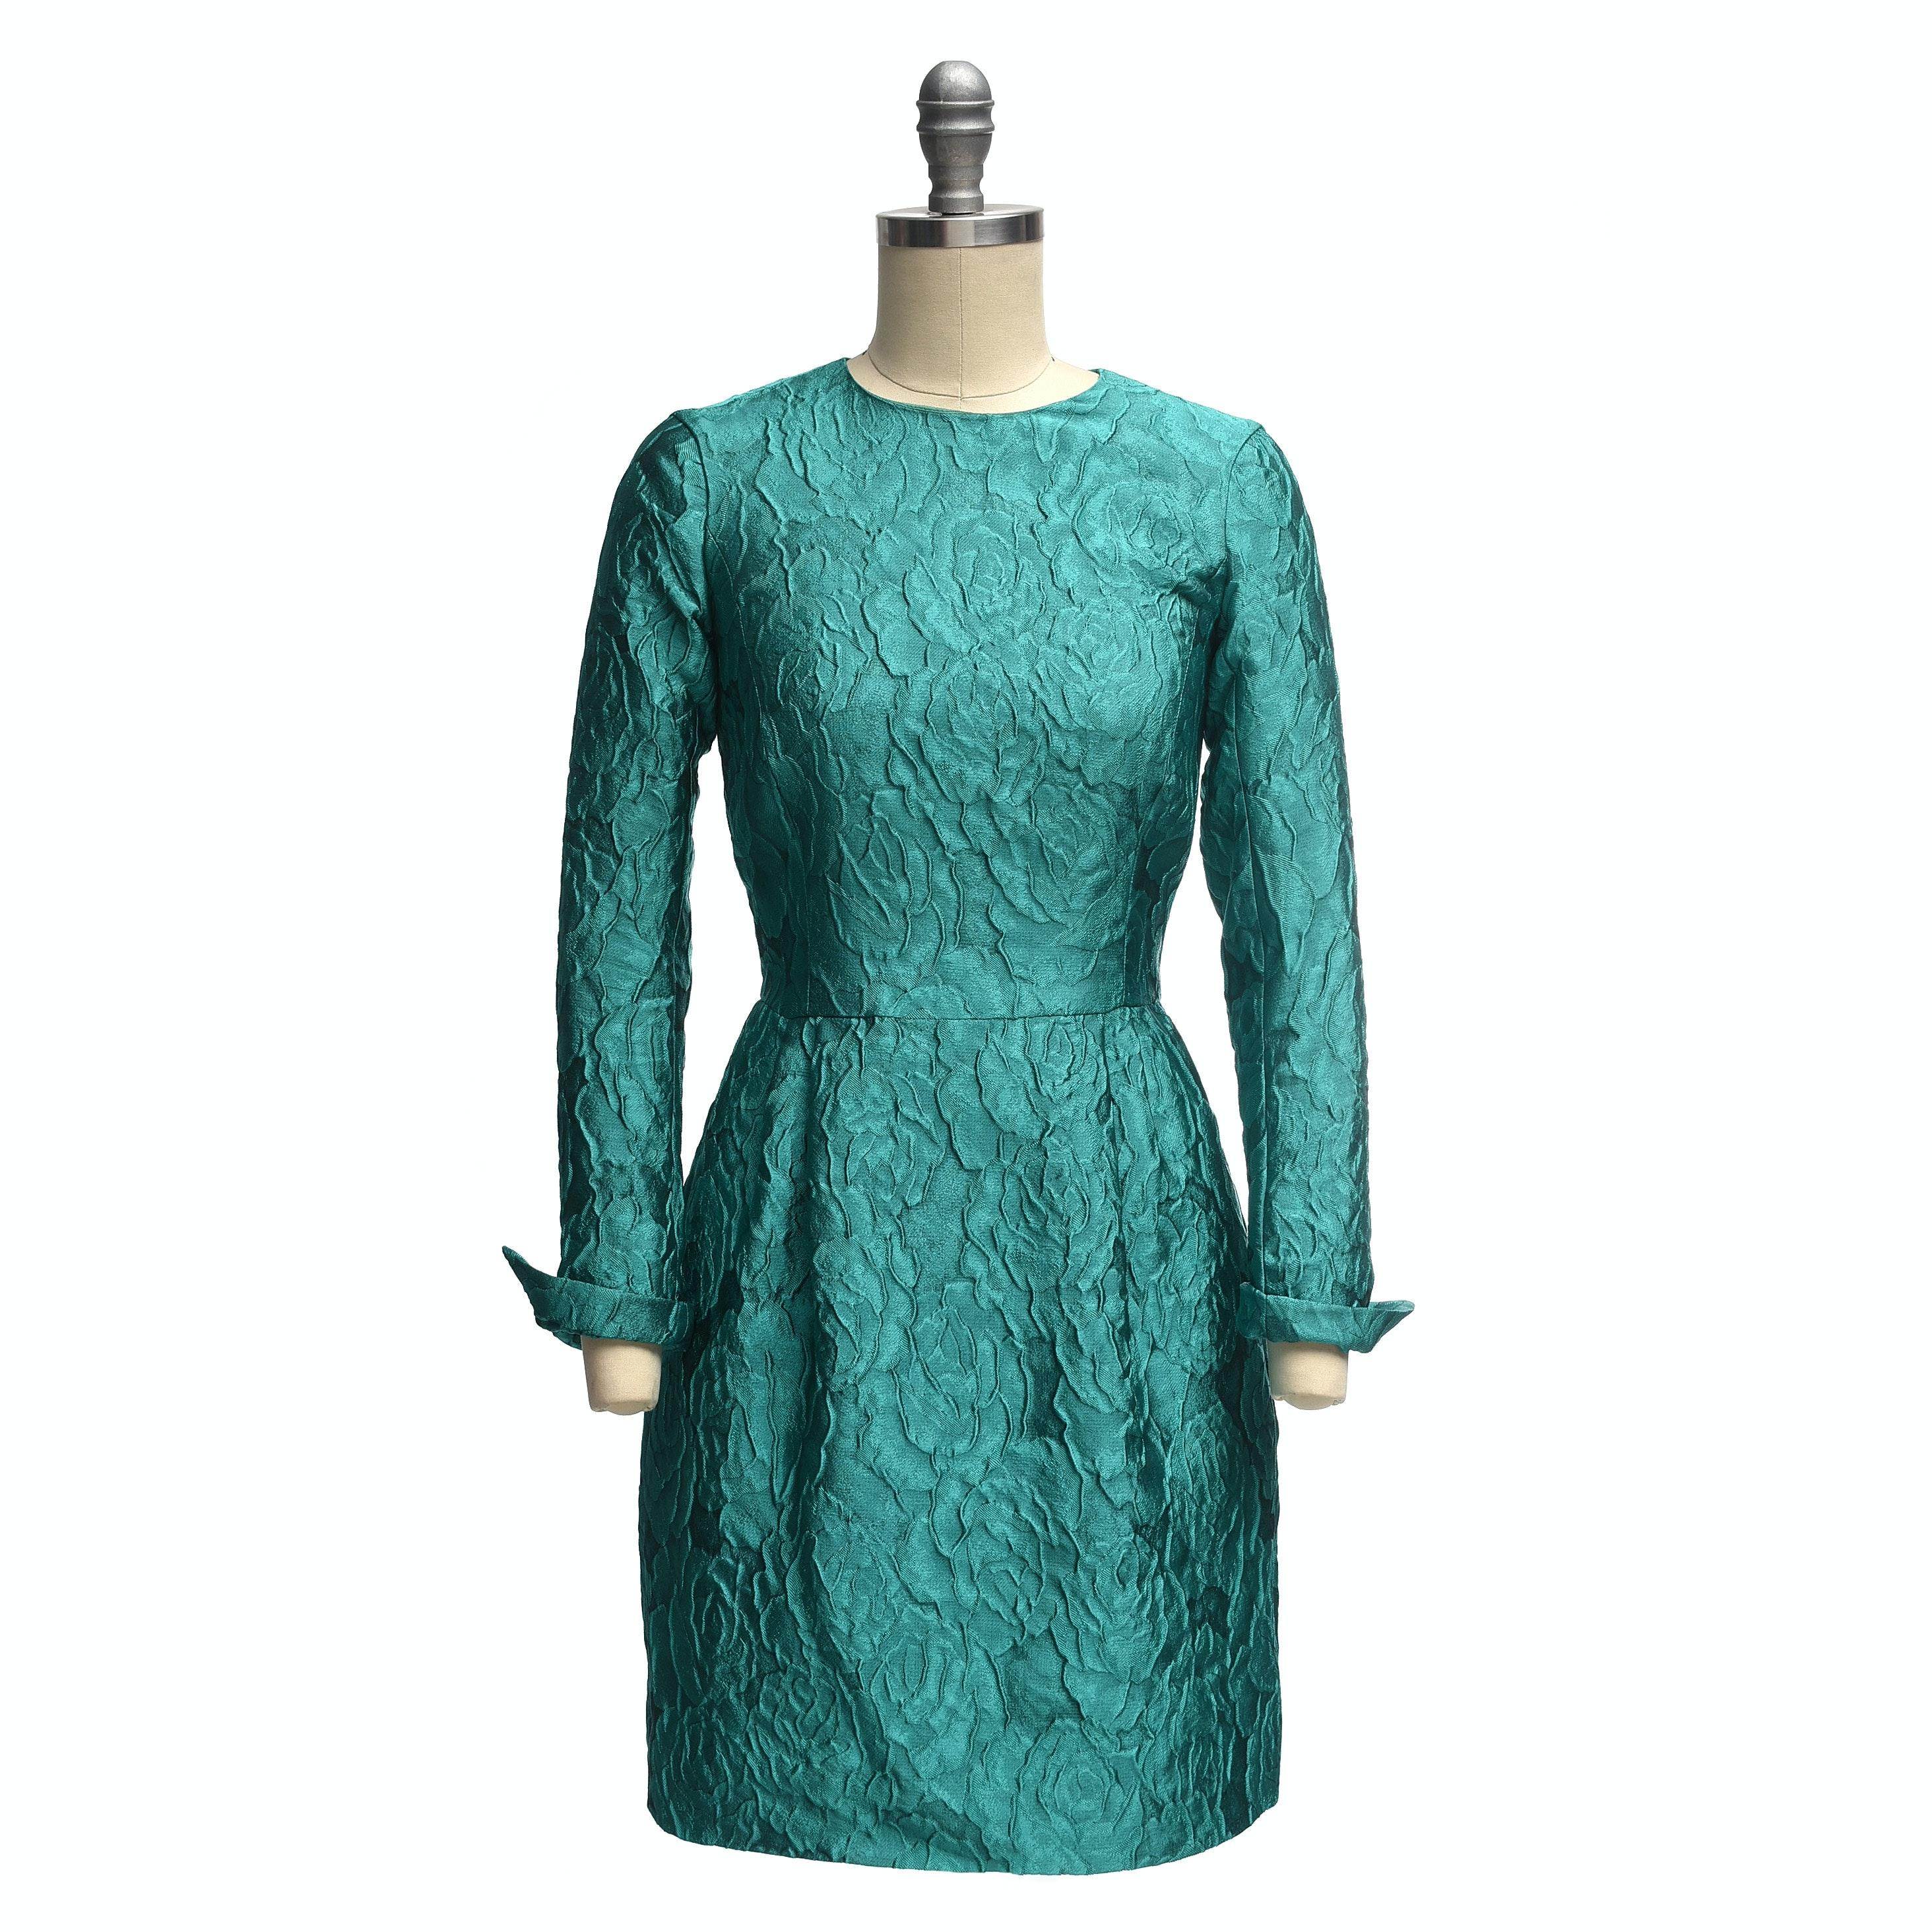 Carolina Herrera Turquoise Long Sleeve Mini Dress in a Textured Rose Motif